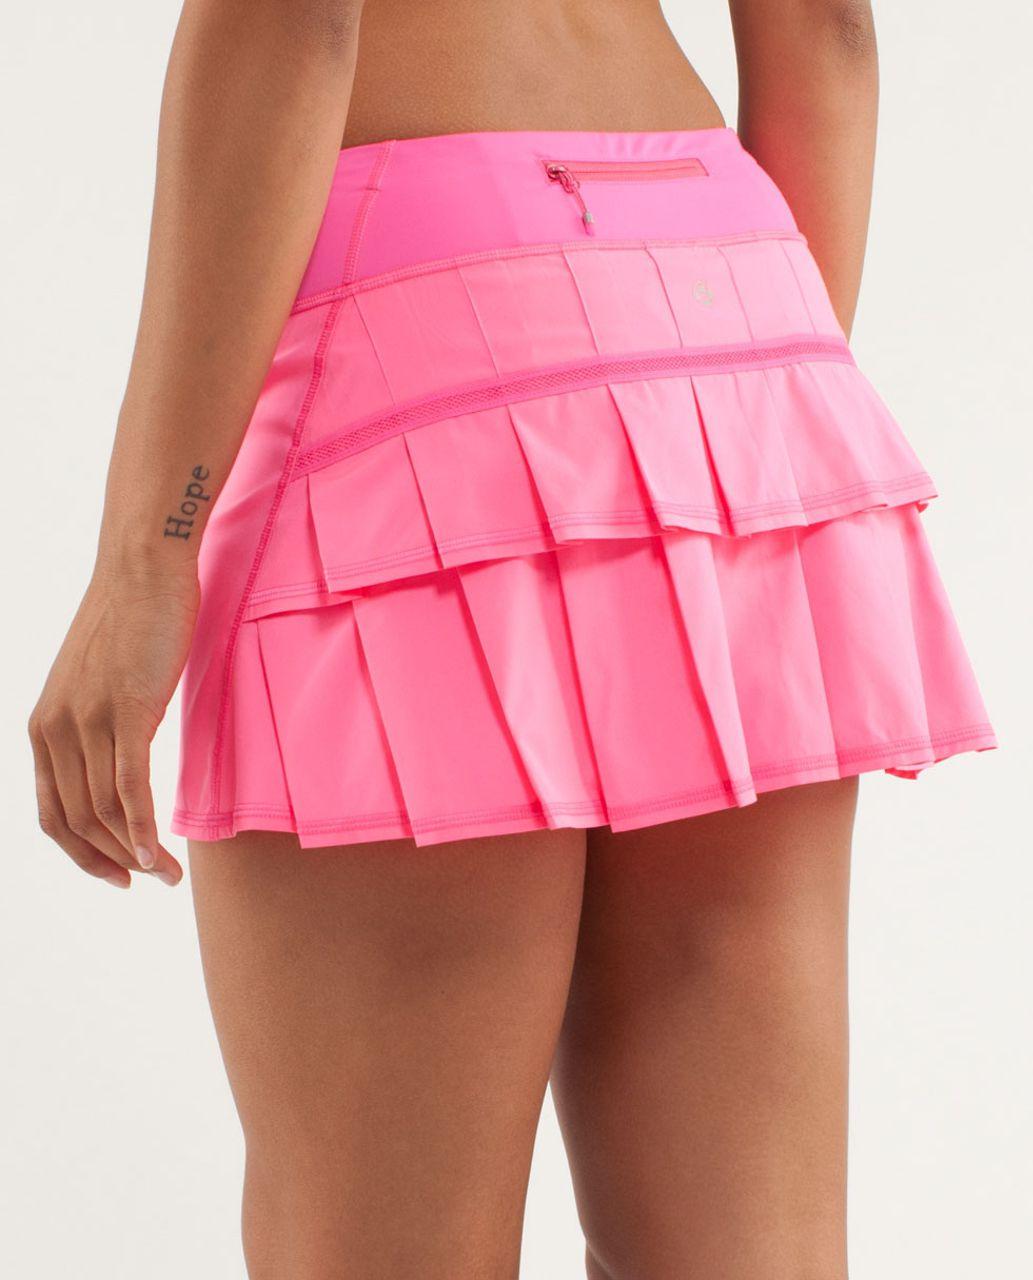 Lululemon Run:  Pace Setter Skirt (Regular) - Pinkelicious